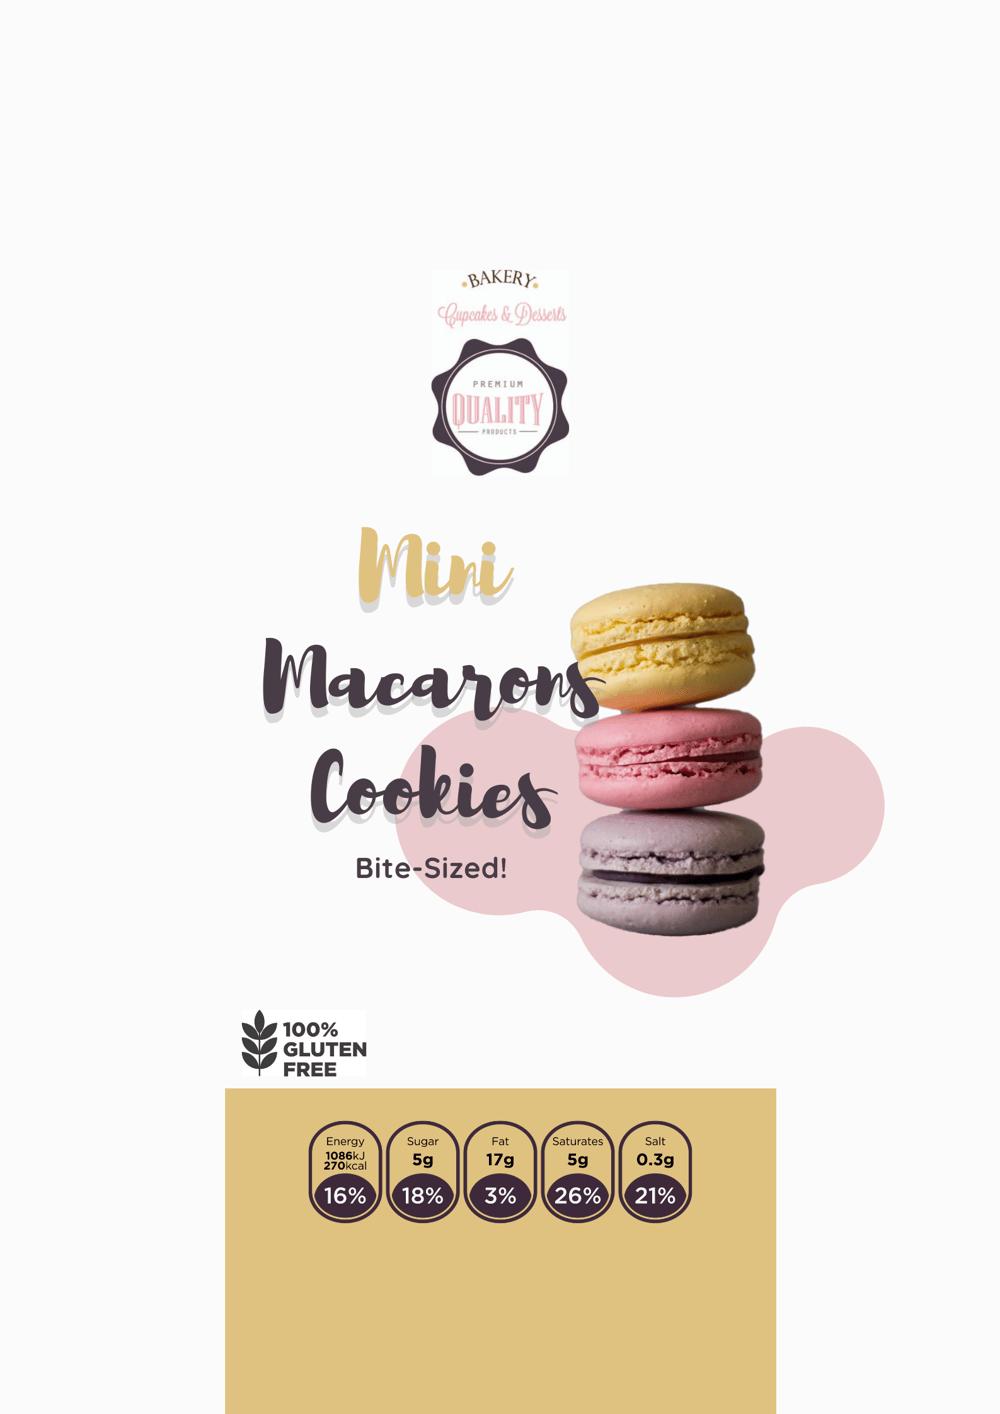 Mini Macaron Cookies - image 1 - student project